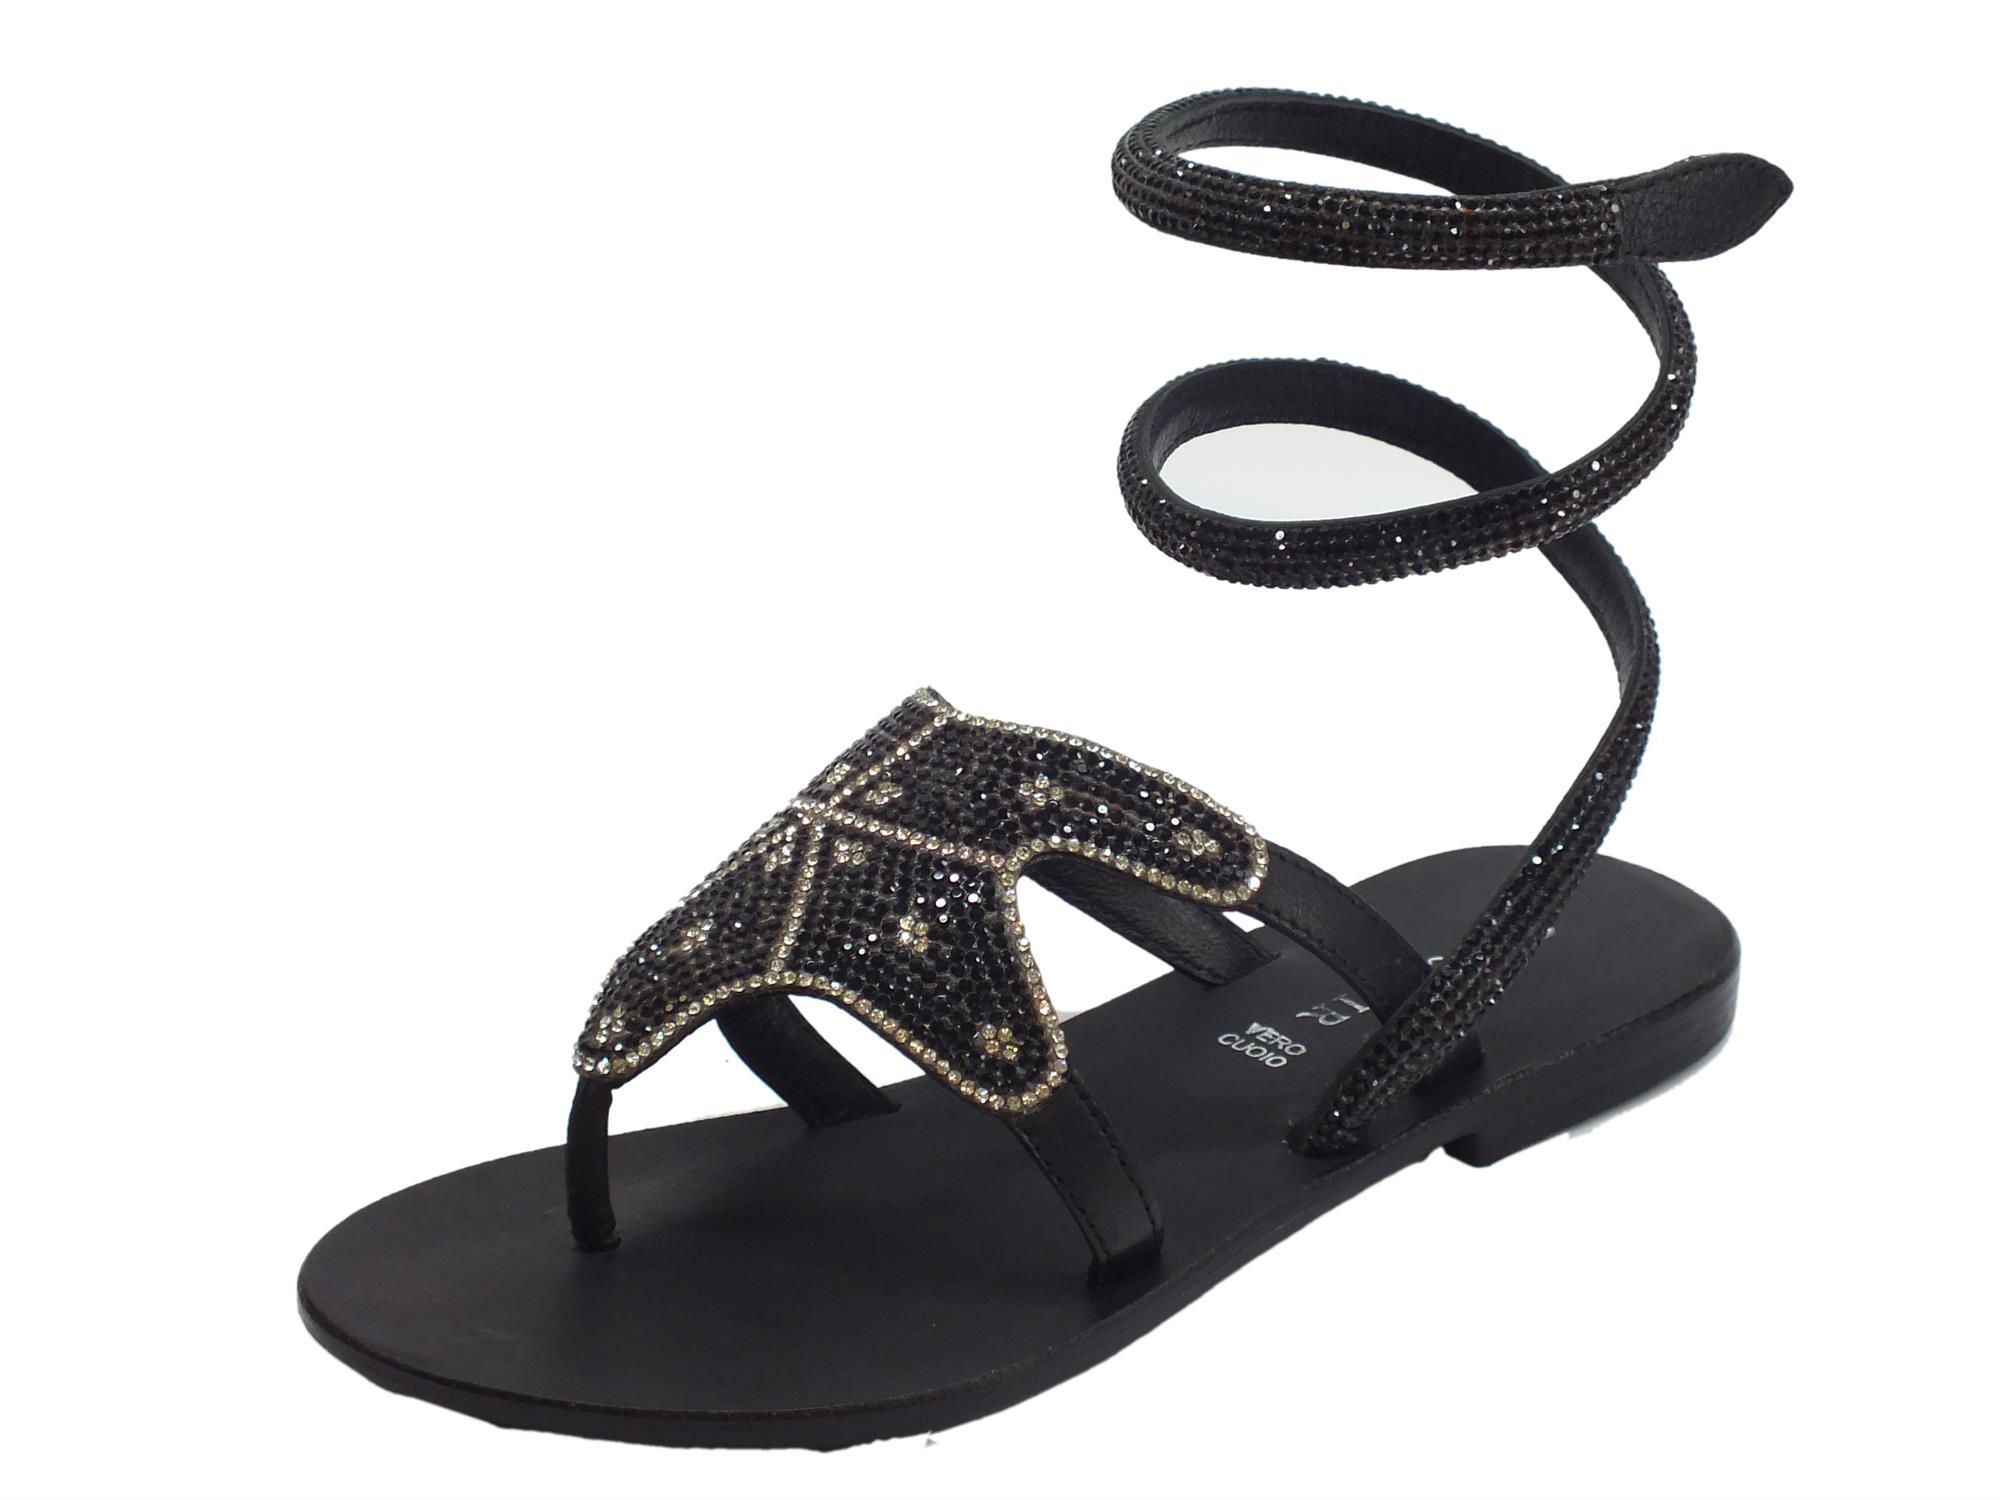 Sandali neri per donna 77GKCOZ9Yg